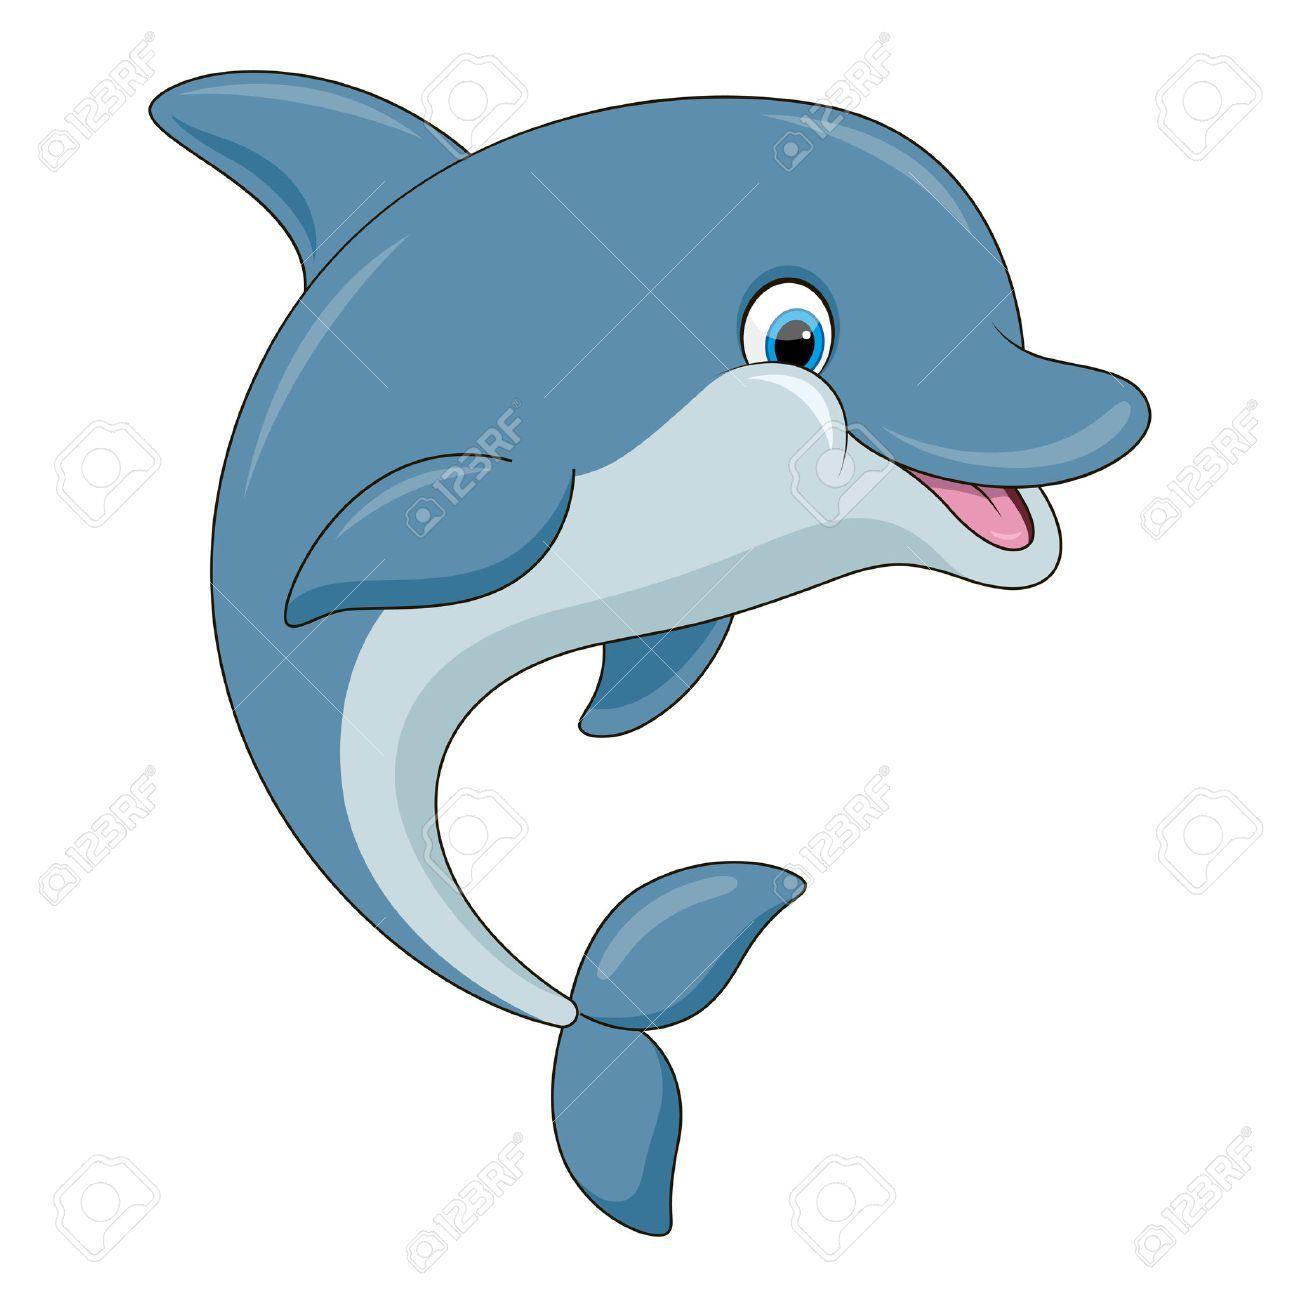 Cute Cartoon Dolphin Illustration With Simple Gradients All Cartoon Dolphin Dolphin Drawing Cartoon Sea Animals